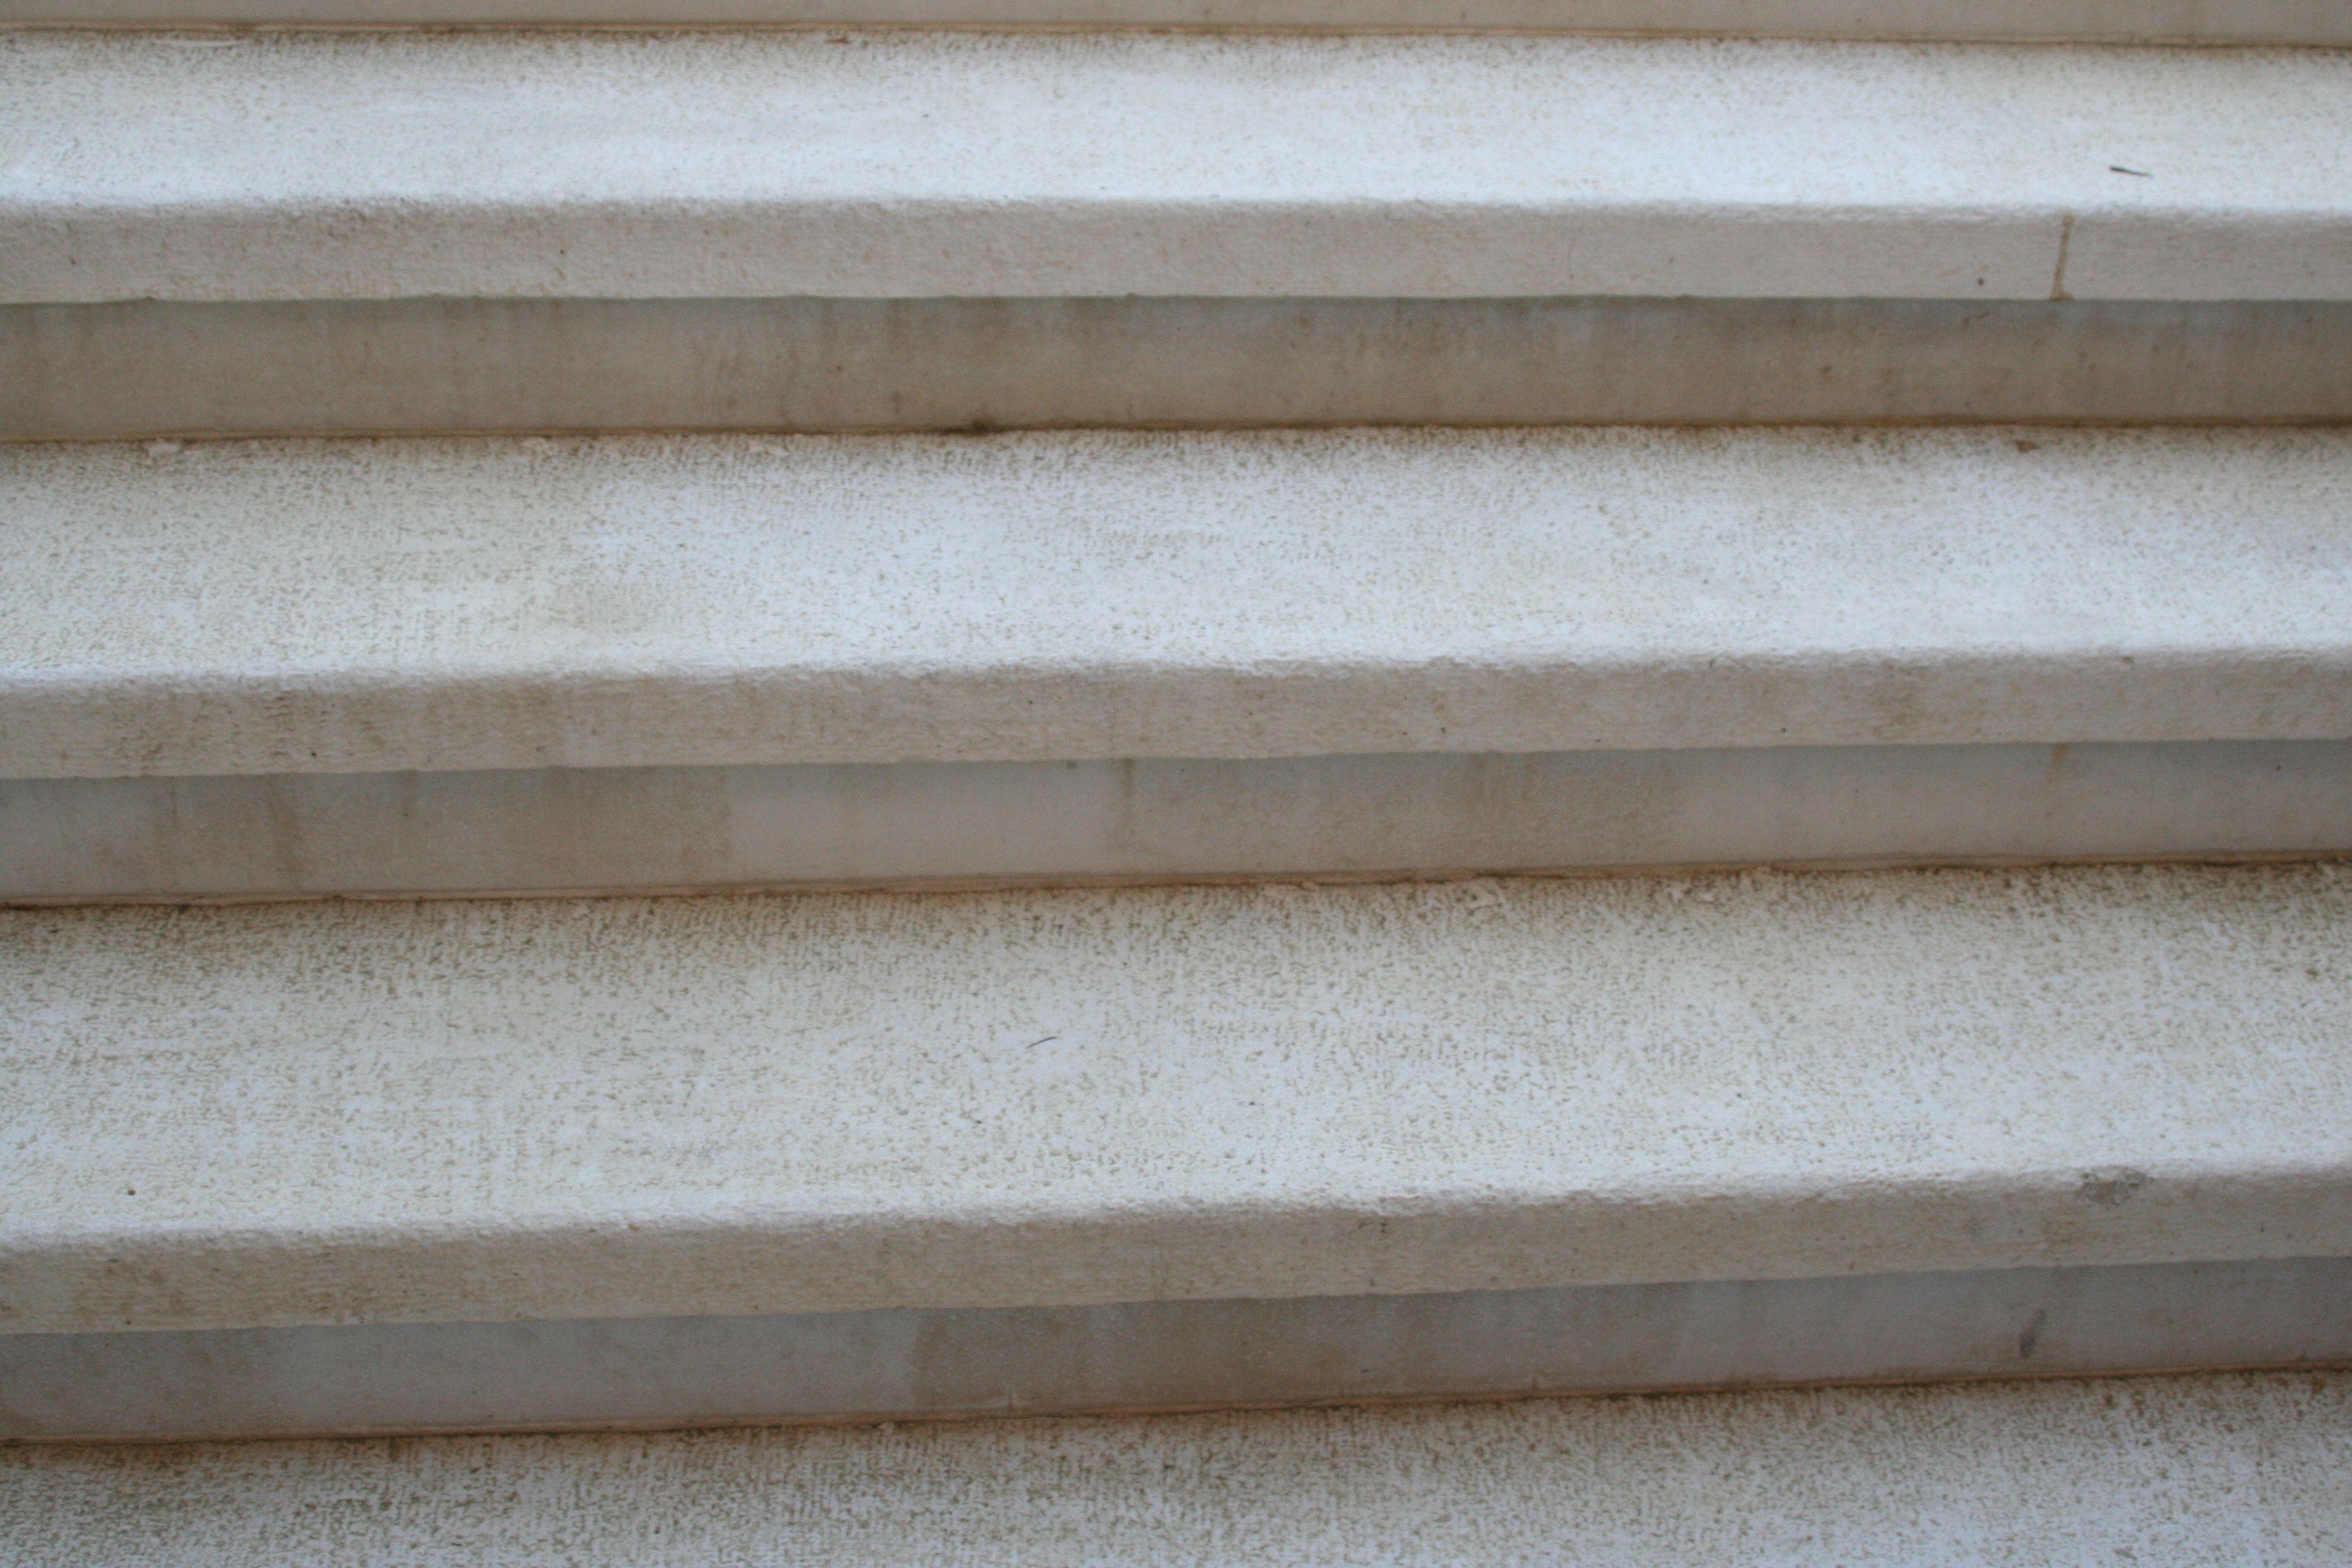 Marche Escalier Plate Aspect Grenaille Antiderapant En Pierre